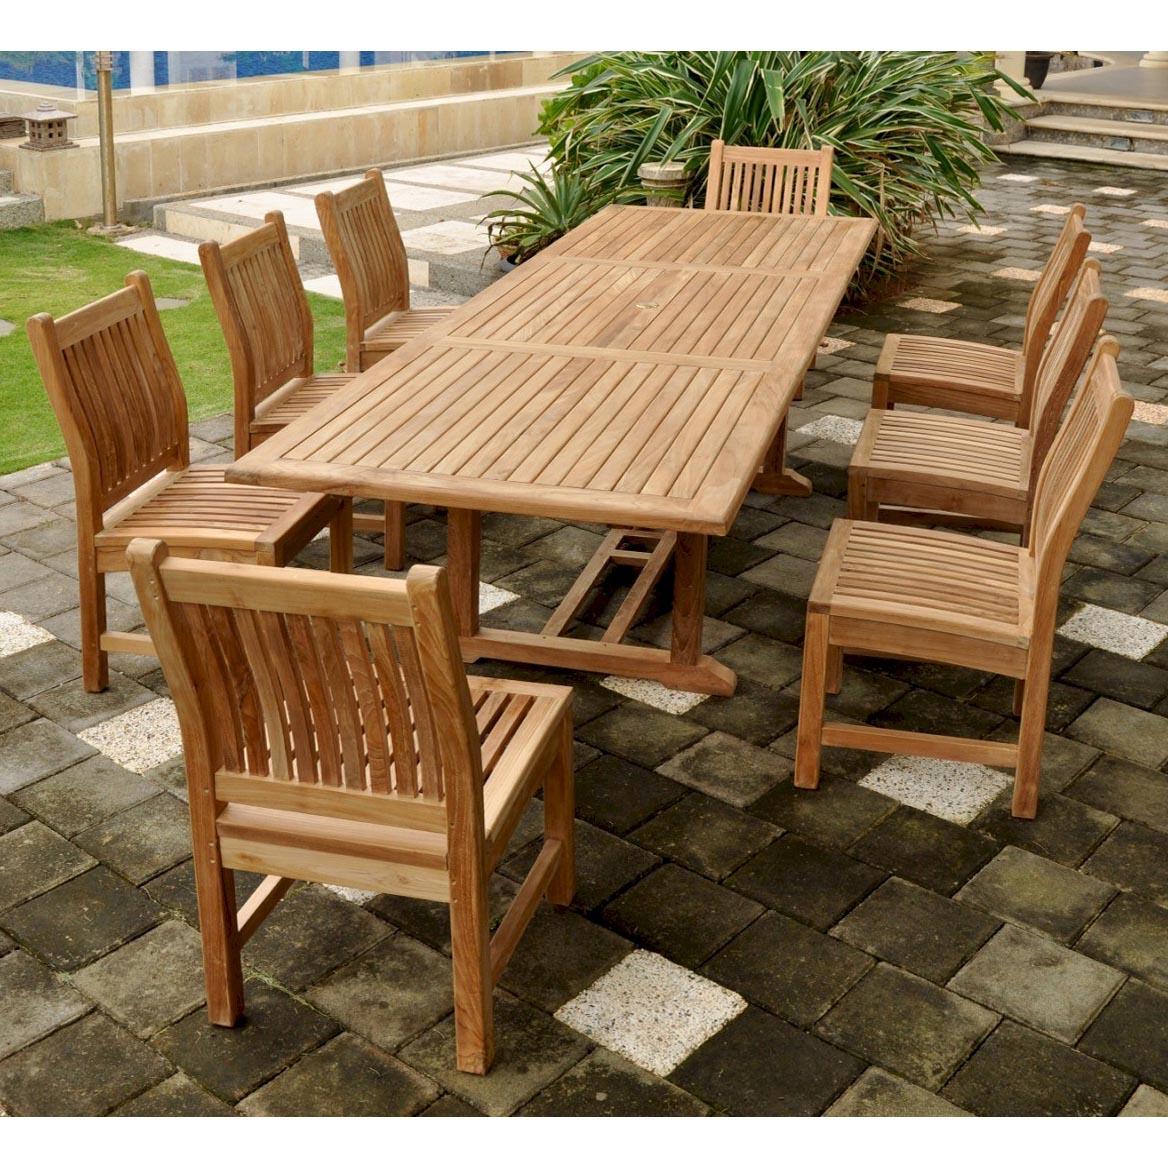 Purchase Teak Bahama Dining Table Set Sahara Side Chairs Product Photo